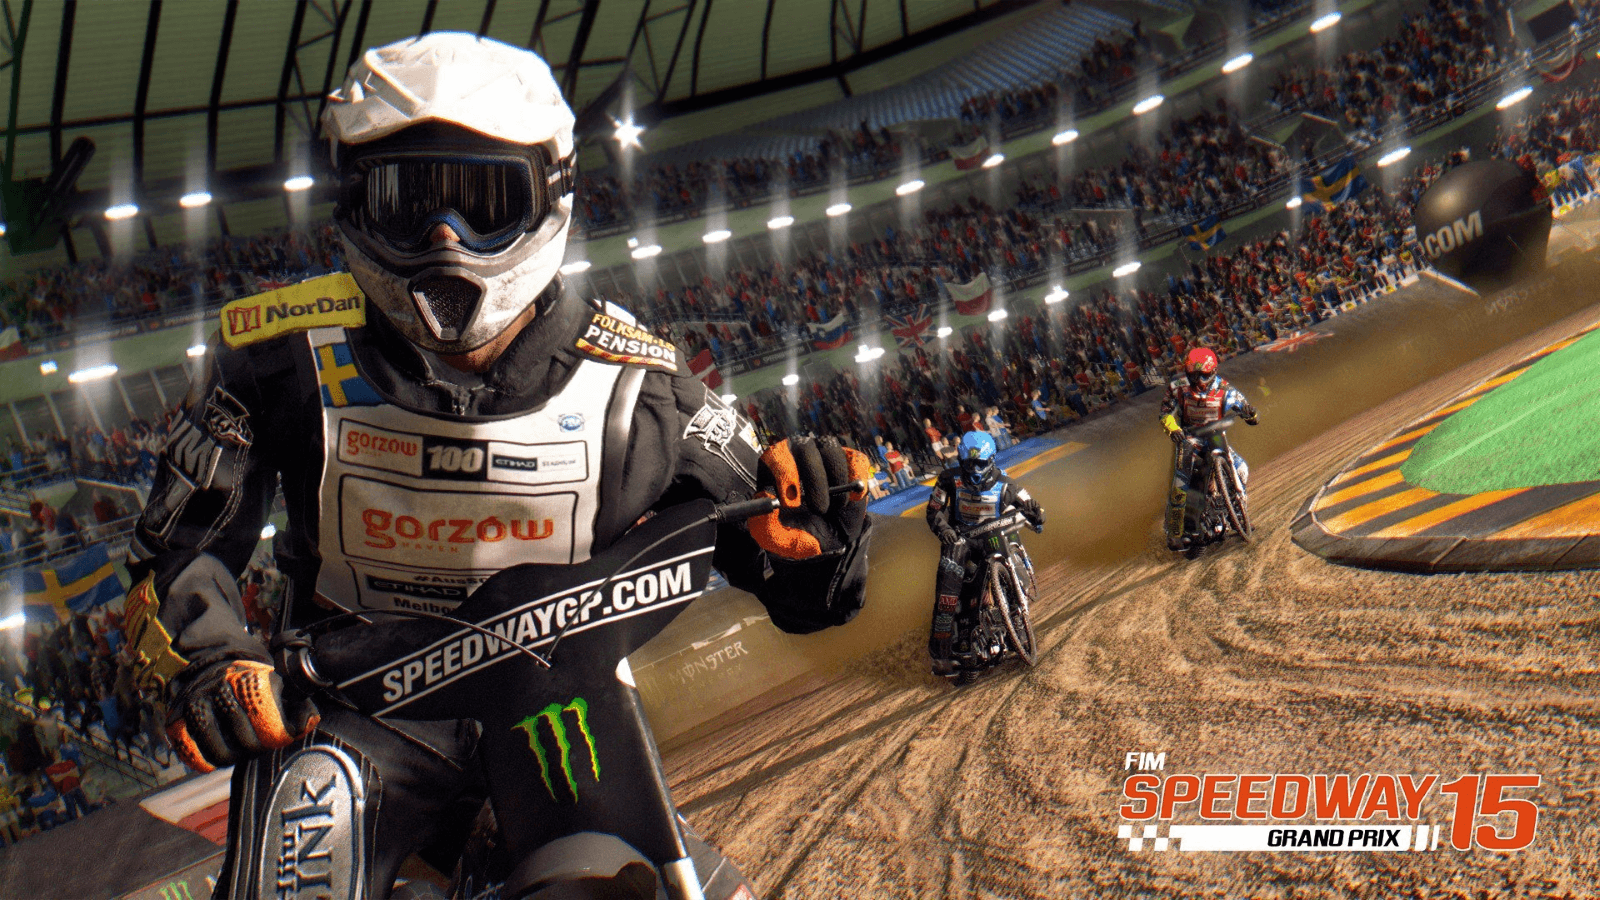 FIM Speedway Grand Prix 15 Gets Massive Multiplayer Update